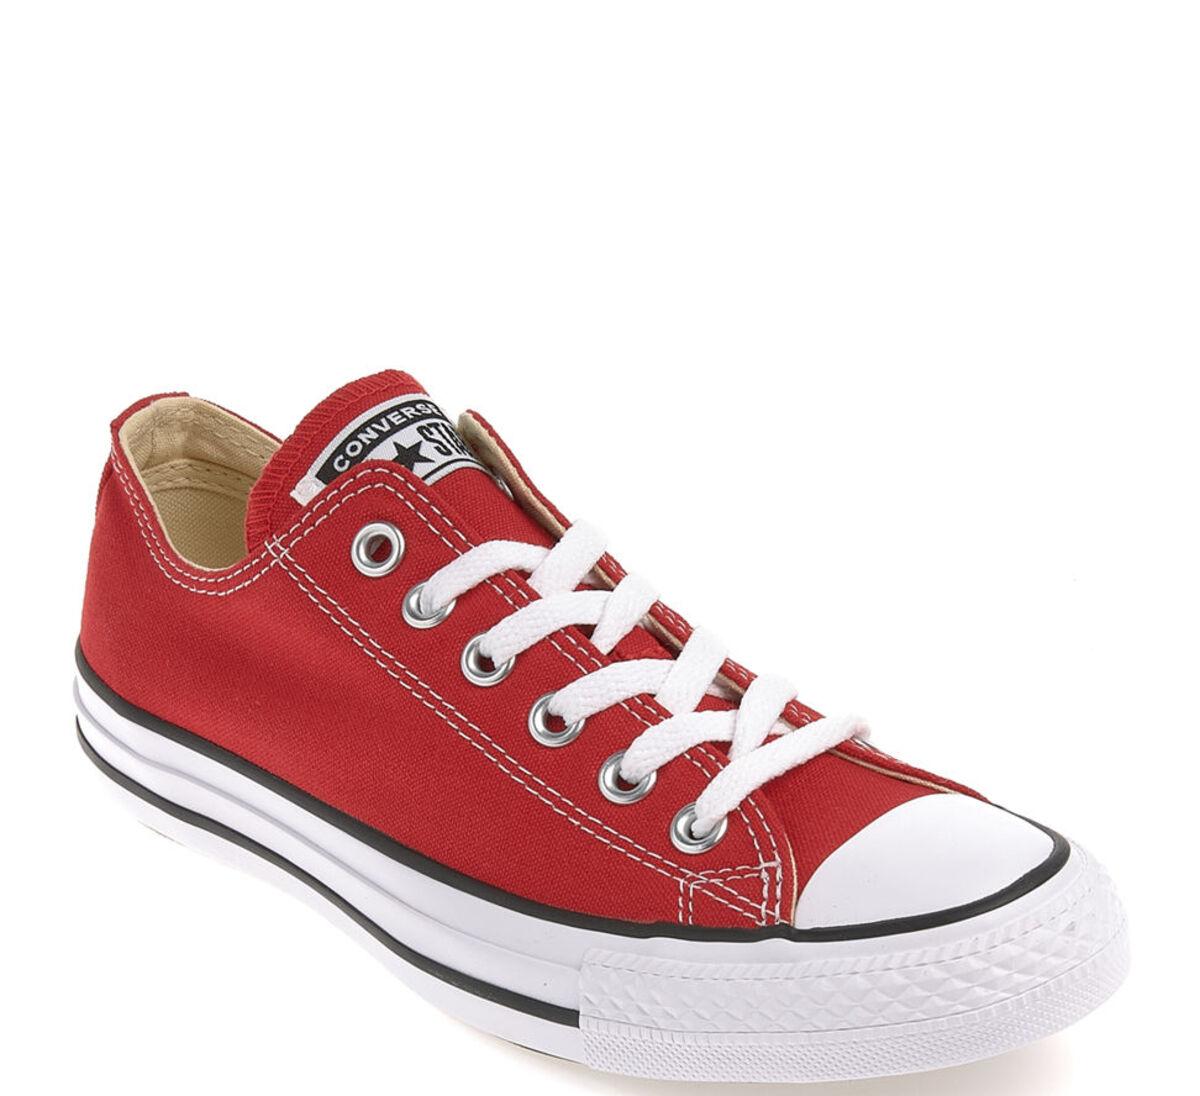 Bild 1 von Converse Sneaker - CHUCK TAYLOR ALL STAR OX